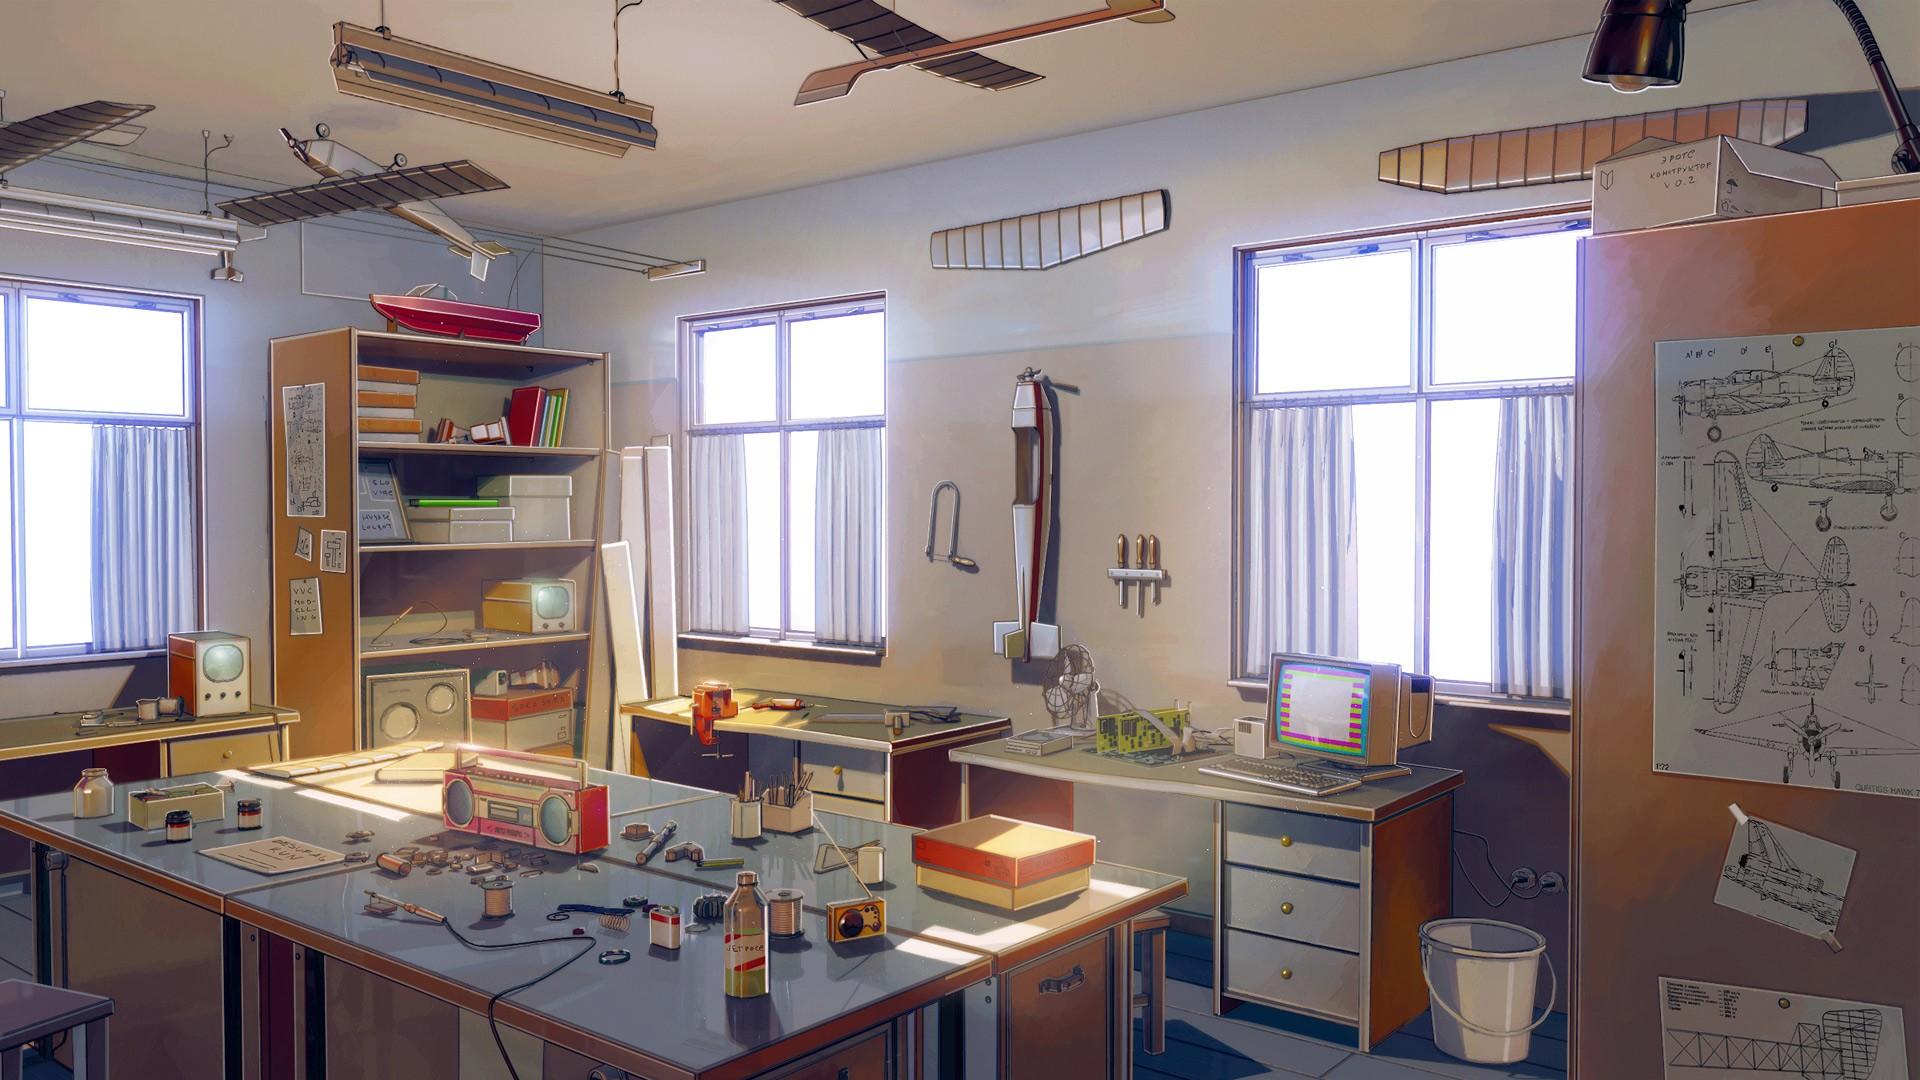 Classroom Kitchen Design ~ Wallpaper room aircraft kitchen computer classroom